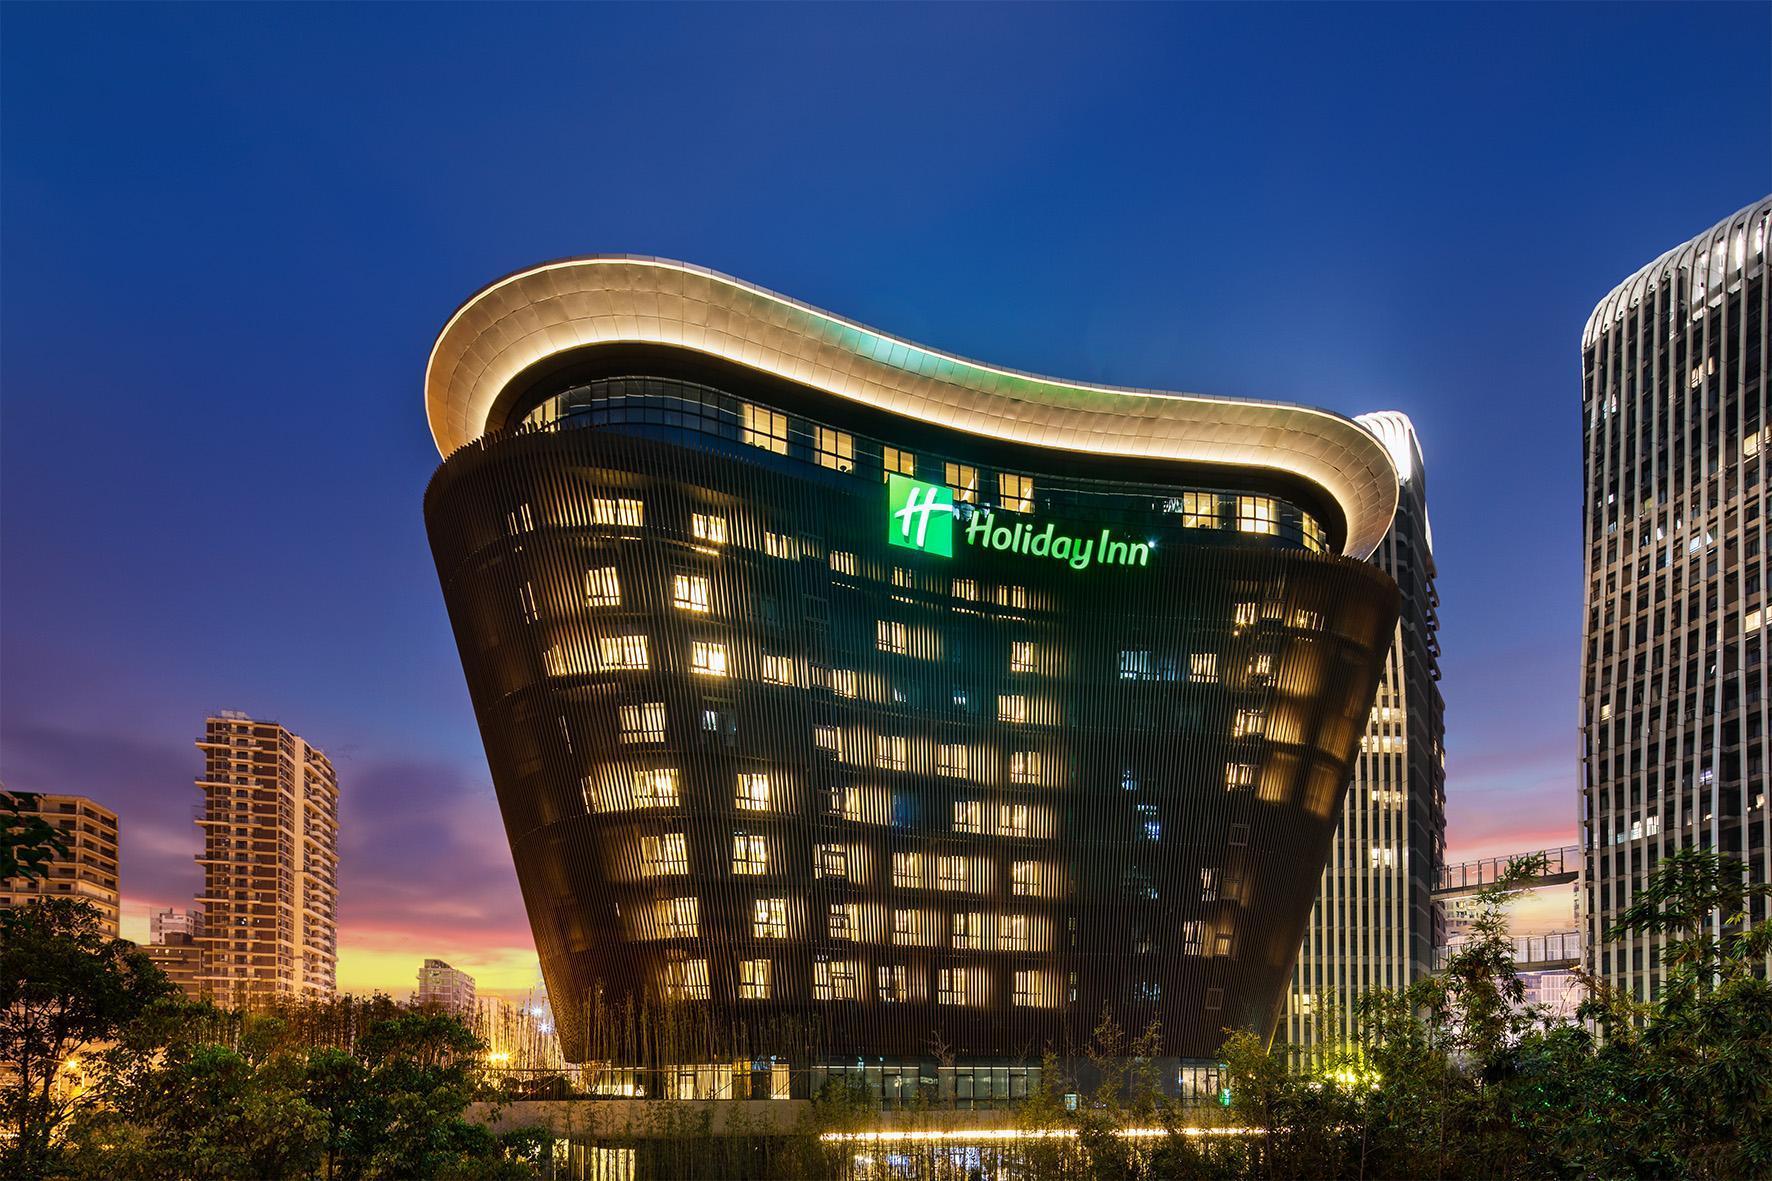 Holiday Inn Nanjing South Station